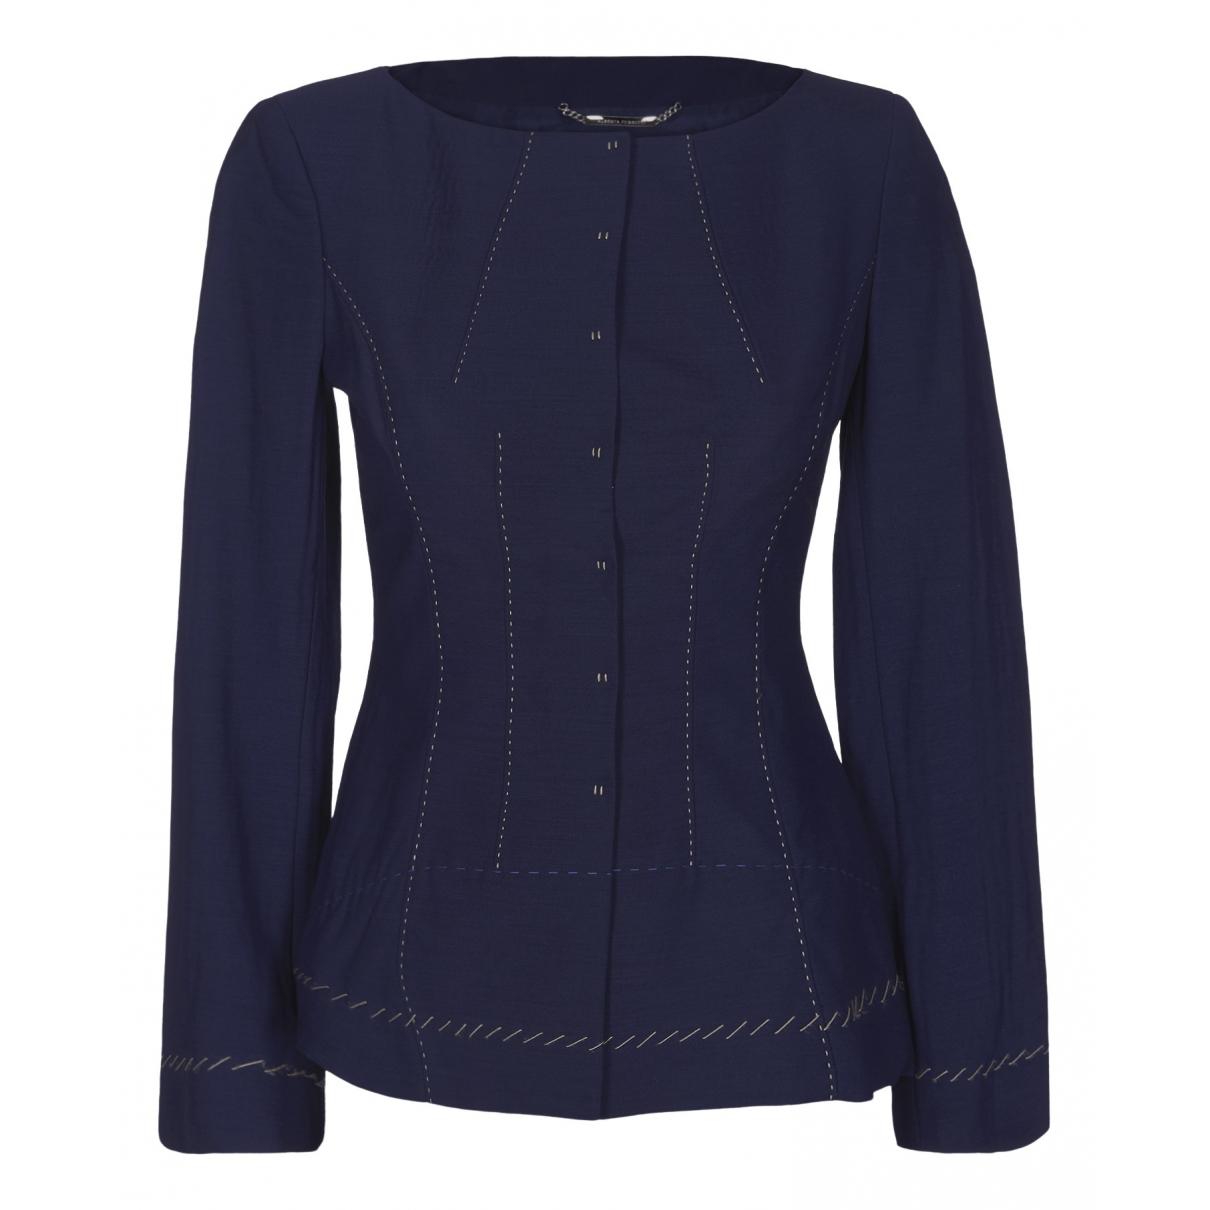 Alberta Ferretti N Blue Cotton jacket for Women 8 UK